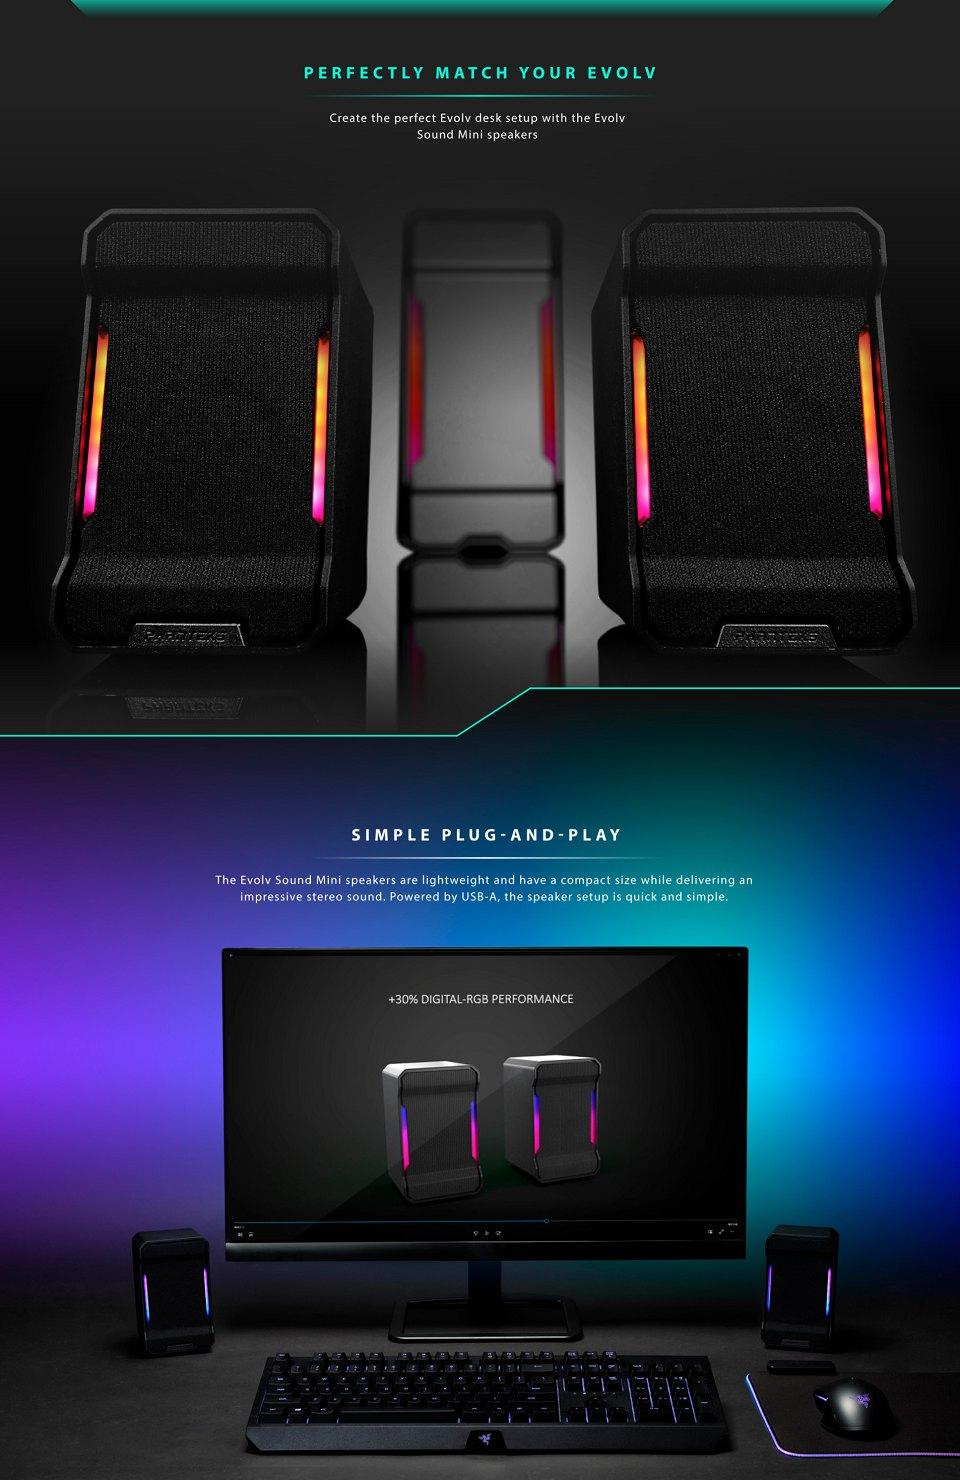 Phanteks Evolv Sound Mini RGB Speakers features